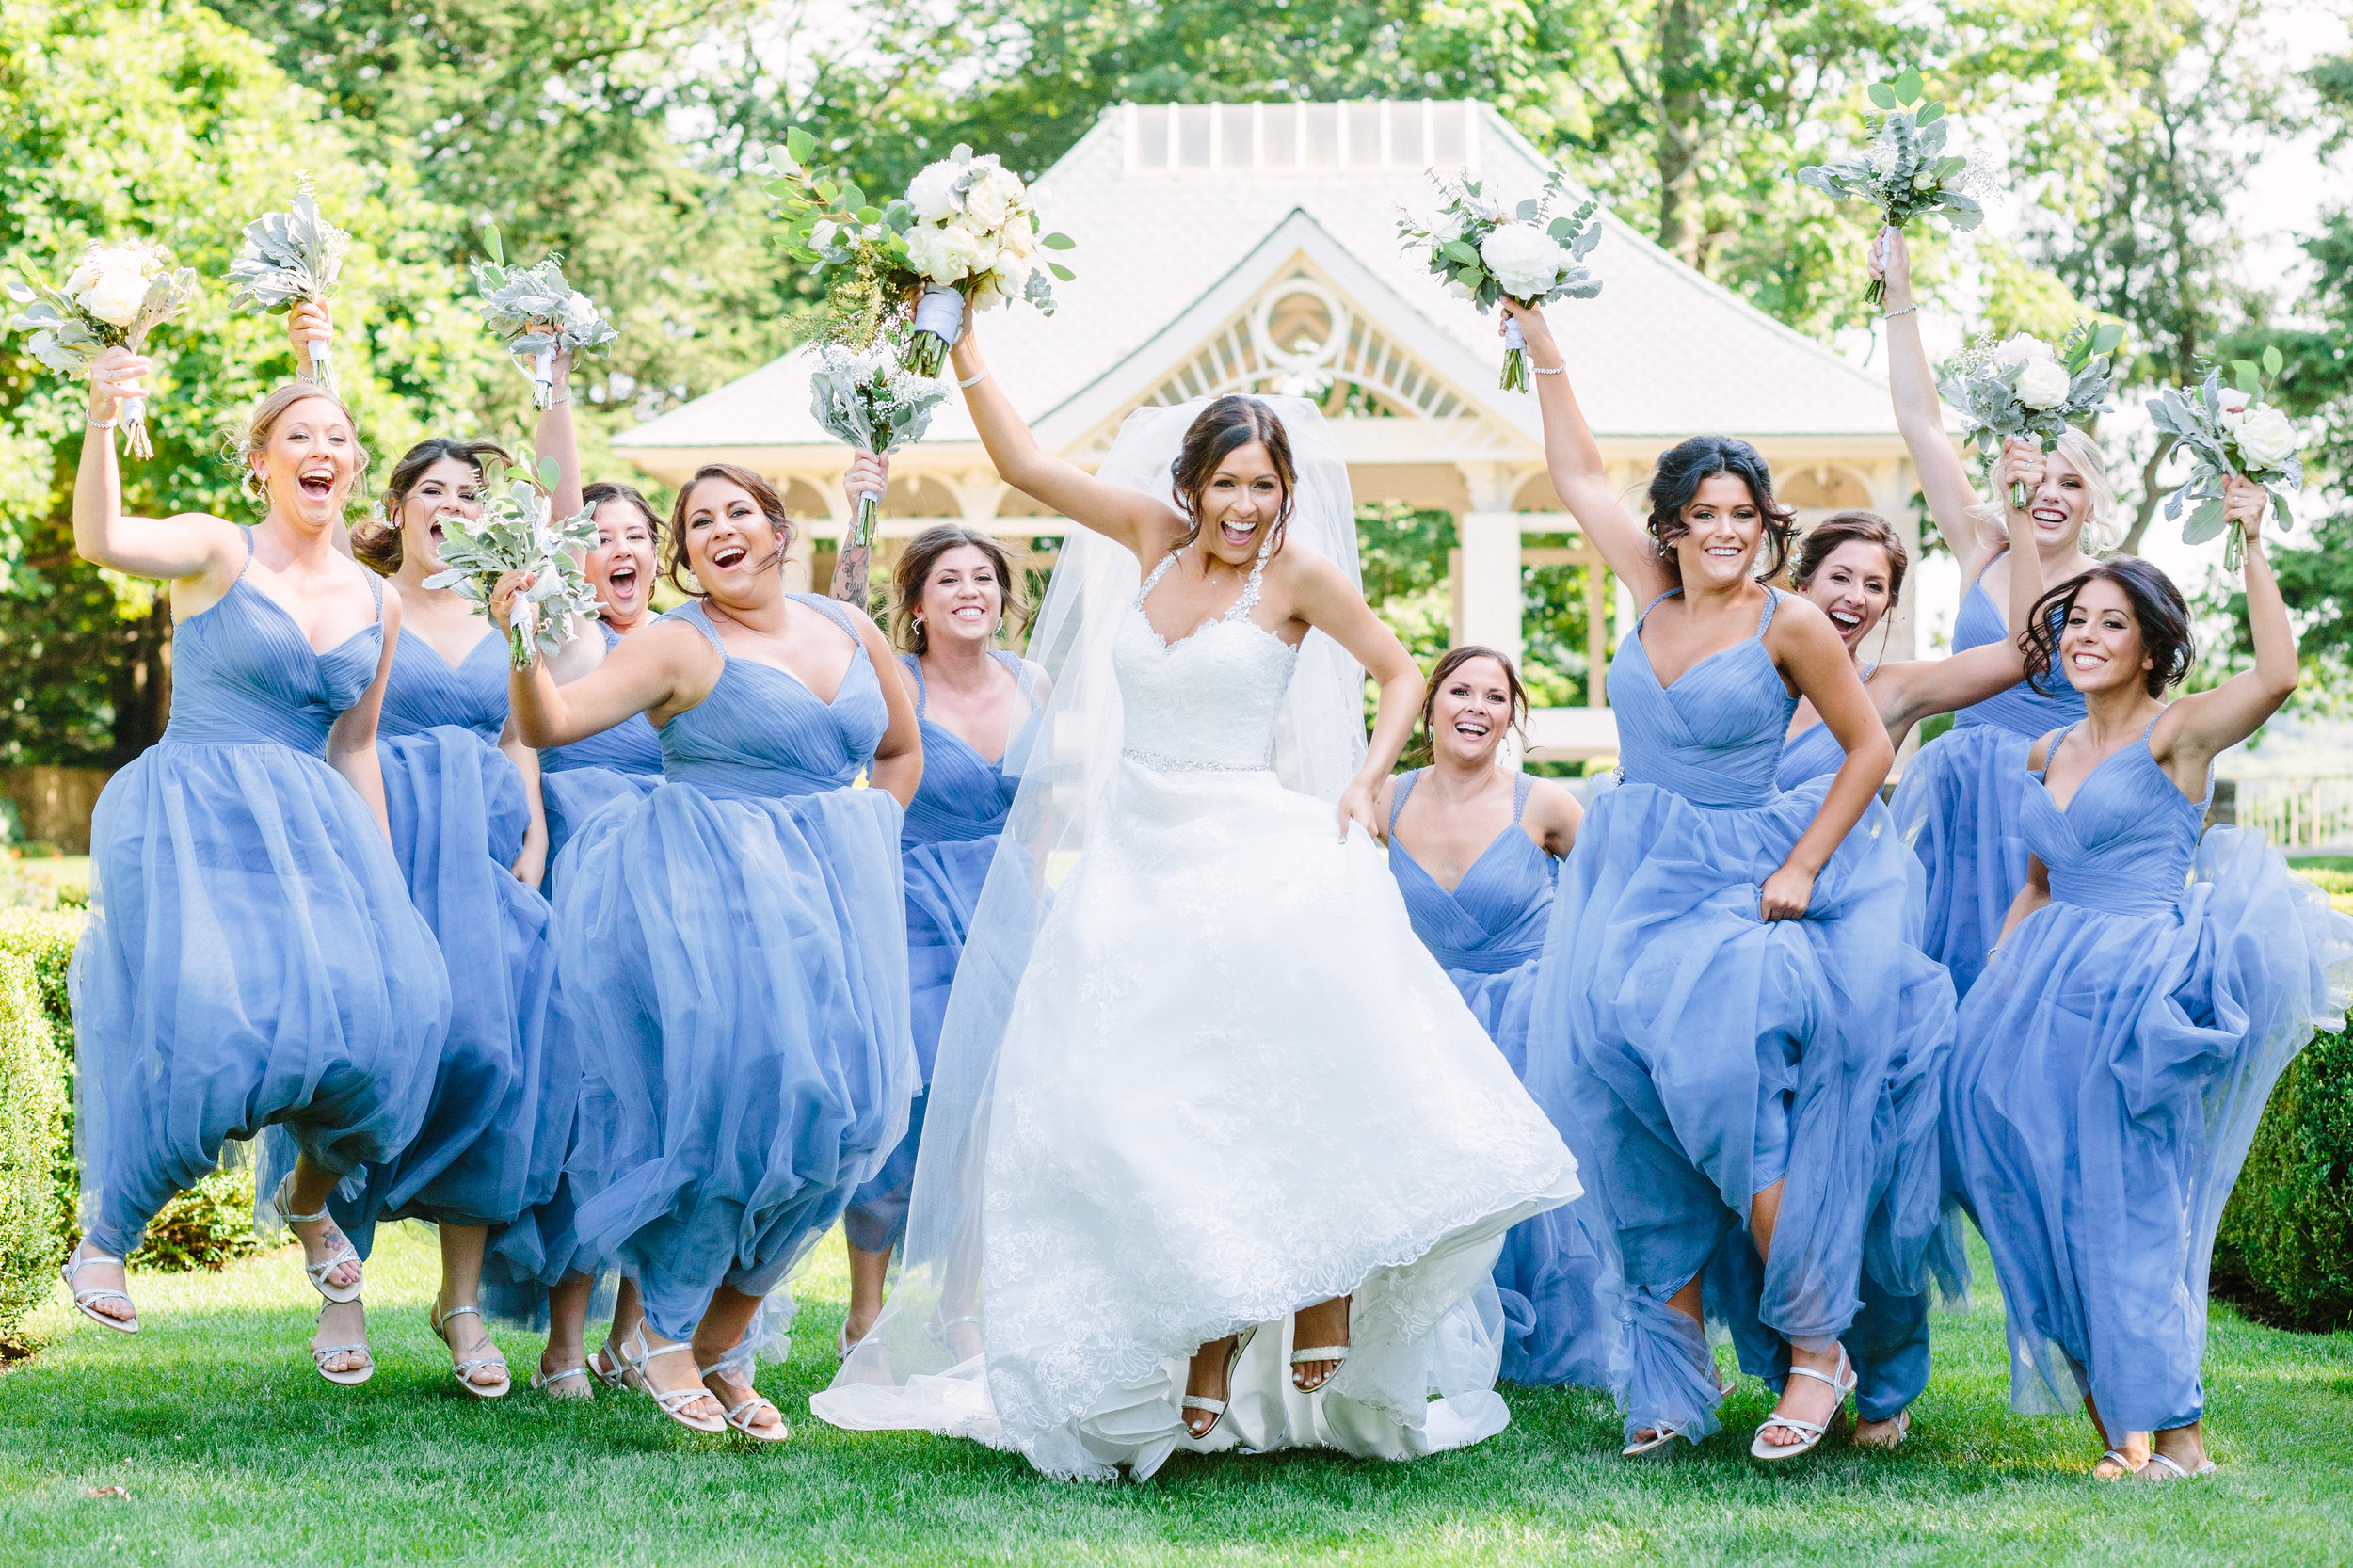 Fun bridal party photos at fellows riverside gardens in mill creek park